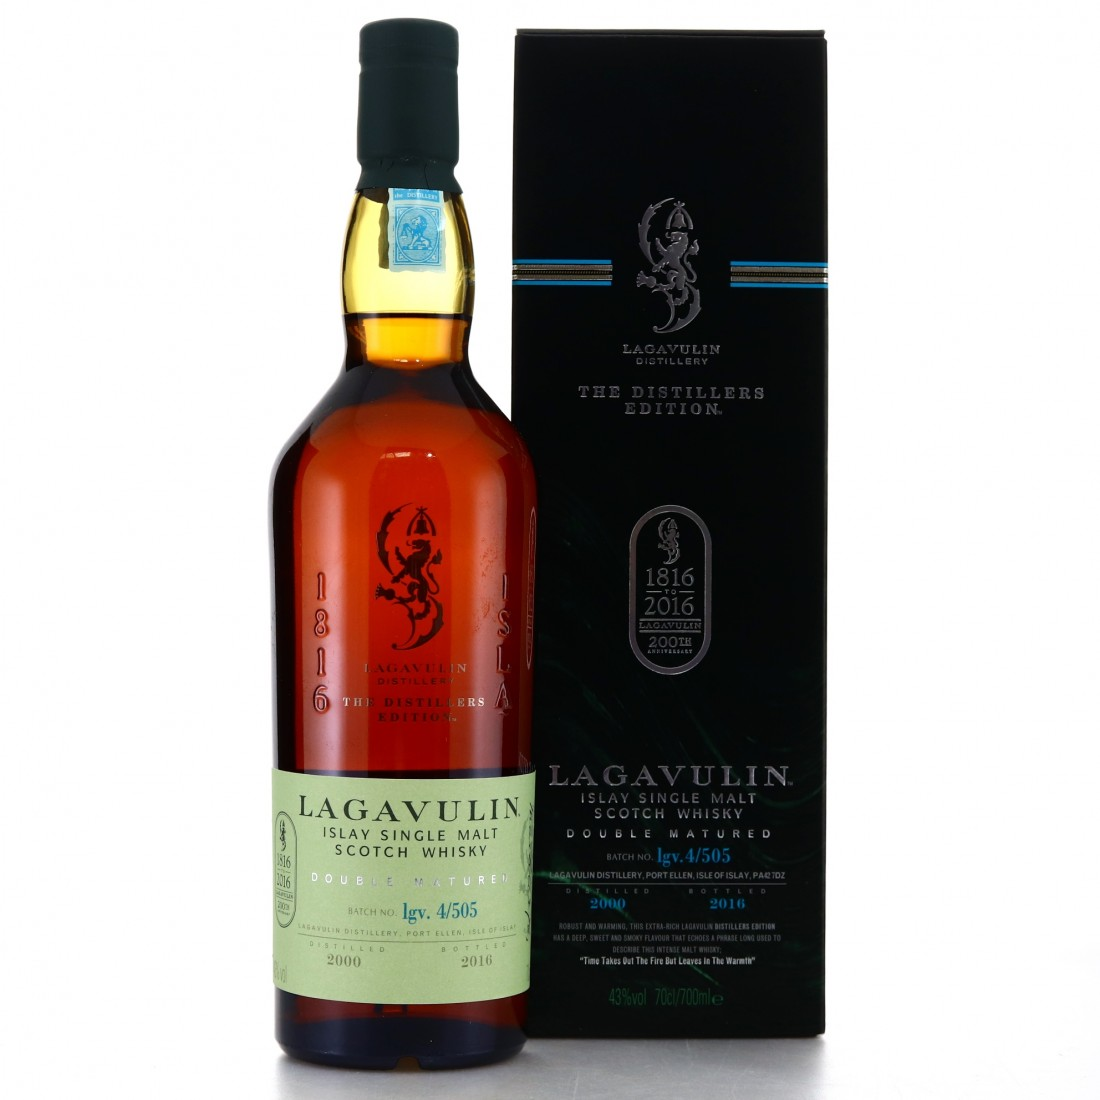 Lagavulin 2000 Distillers Edition / Bicentenary Edition